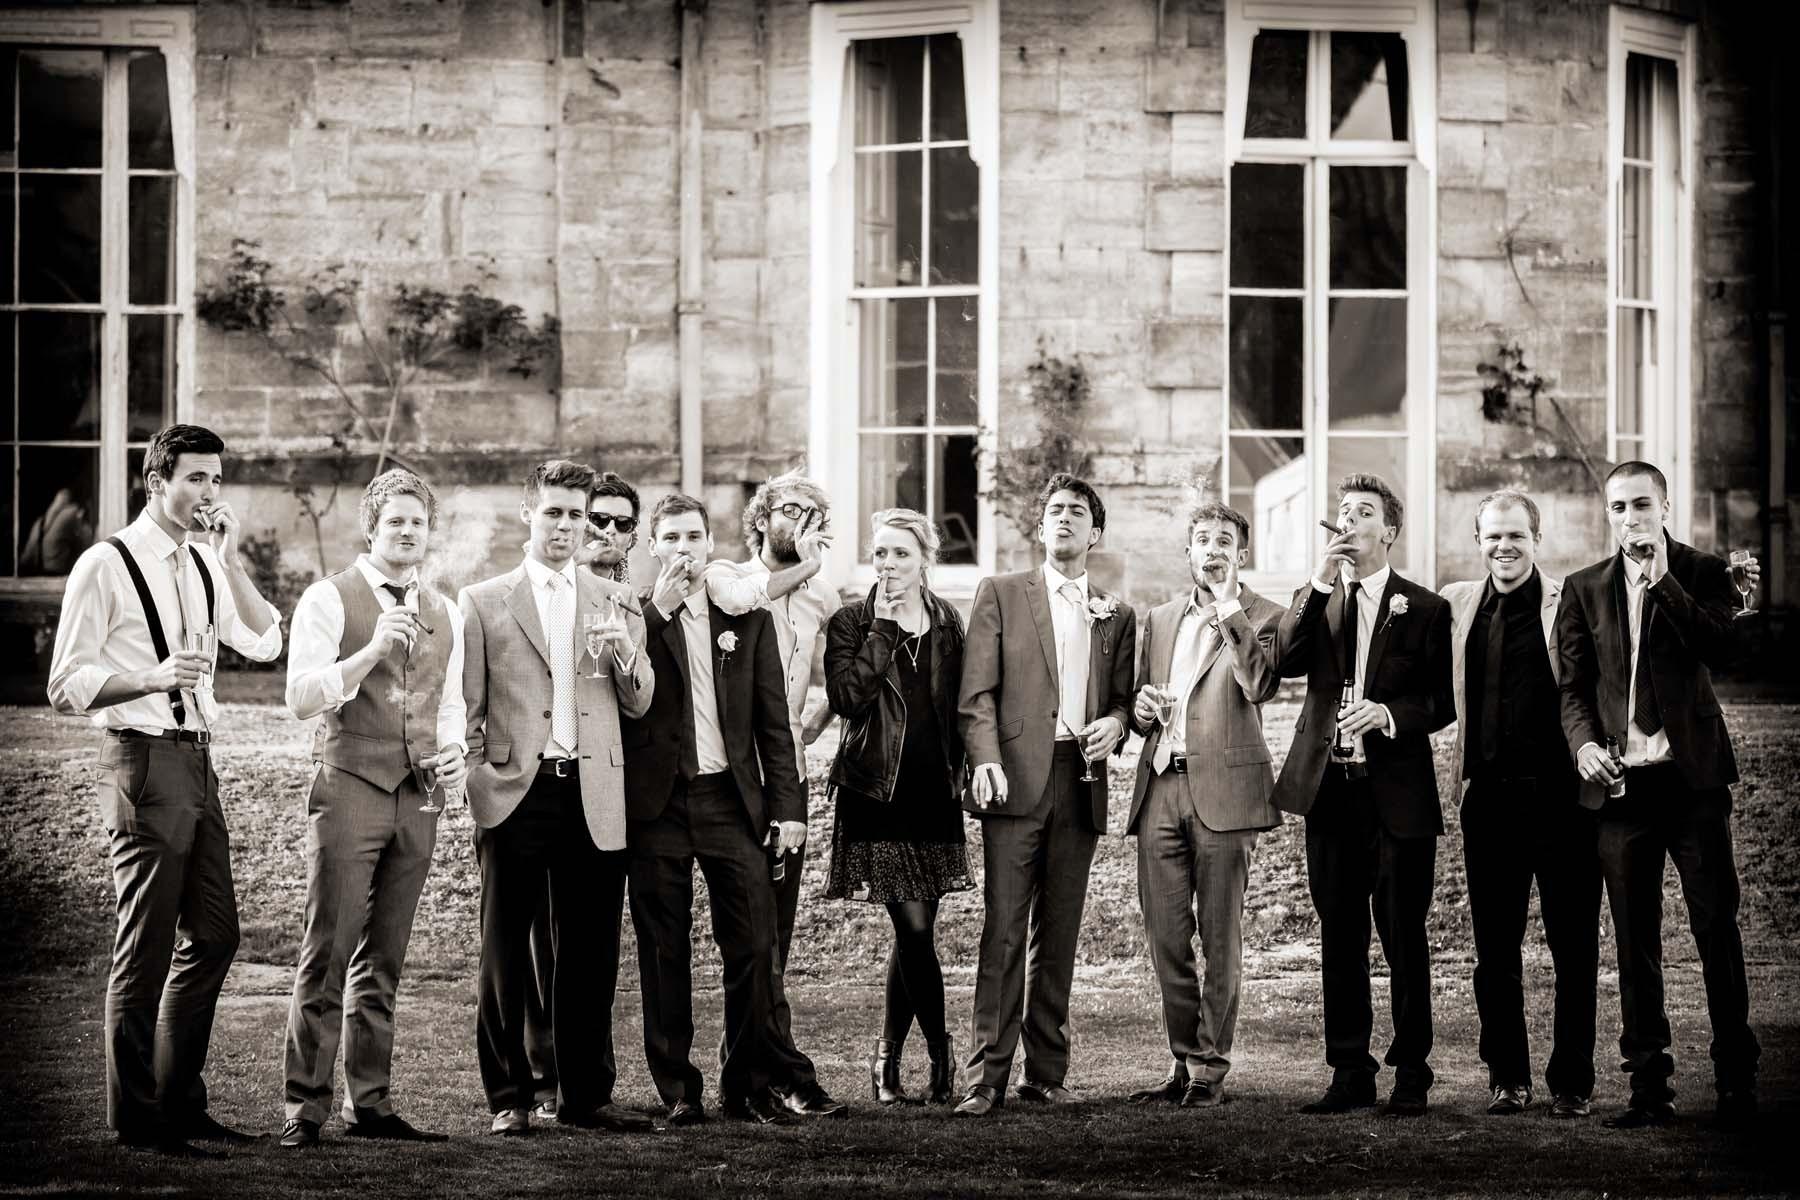 Sussex & Surrey Wedding Photographer - Guests & Groups (2)